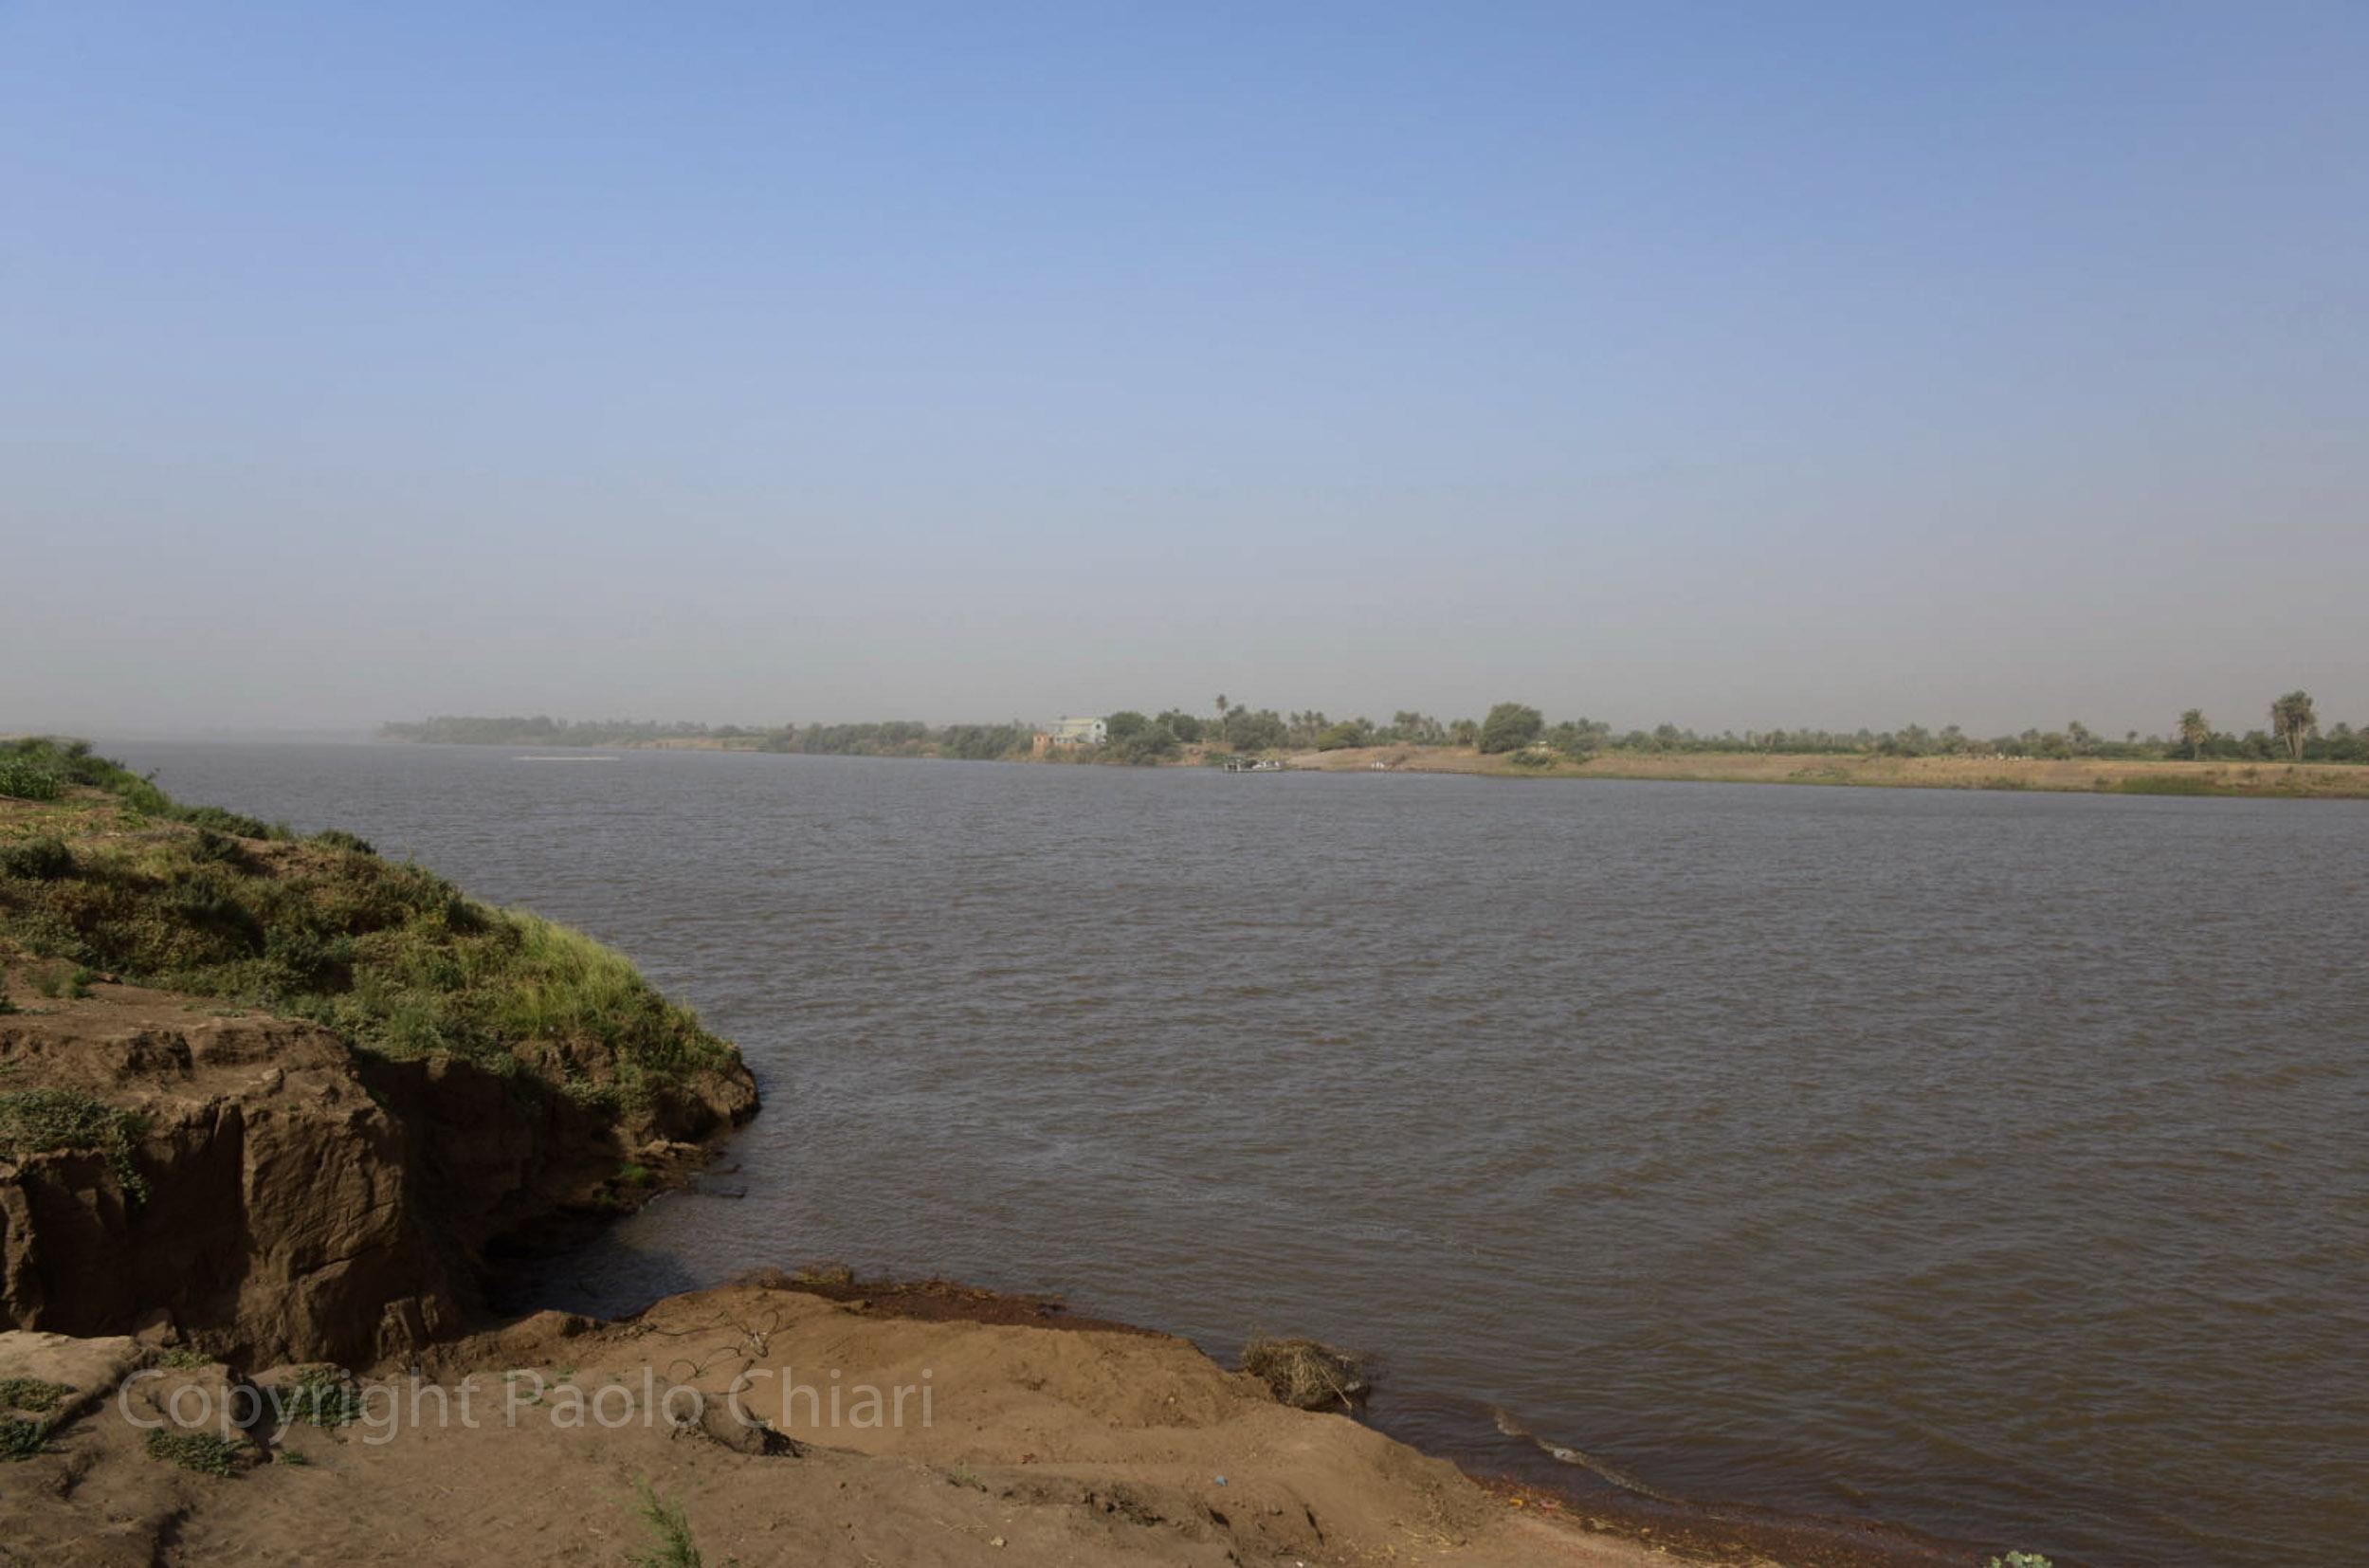 Sudan2013_0230